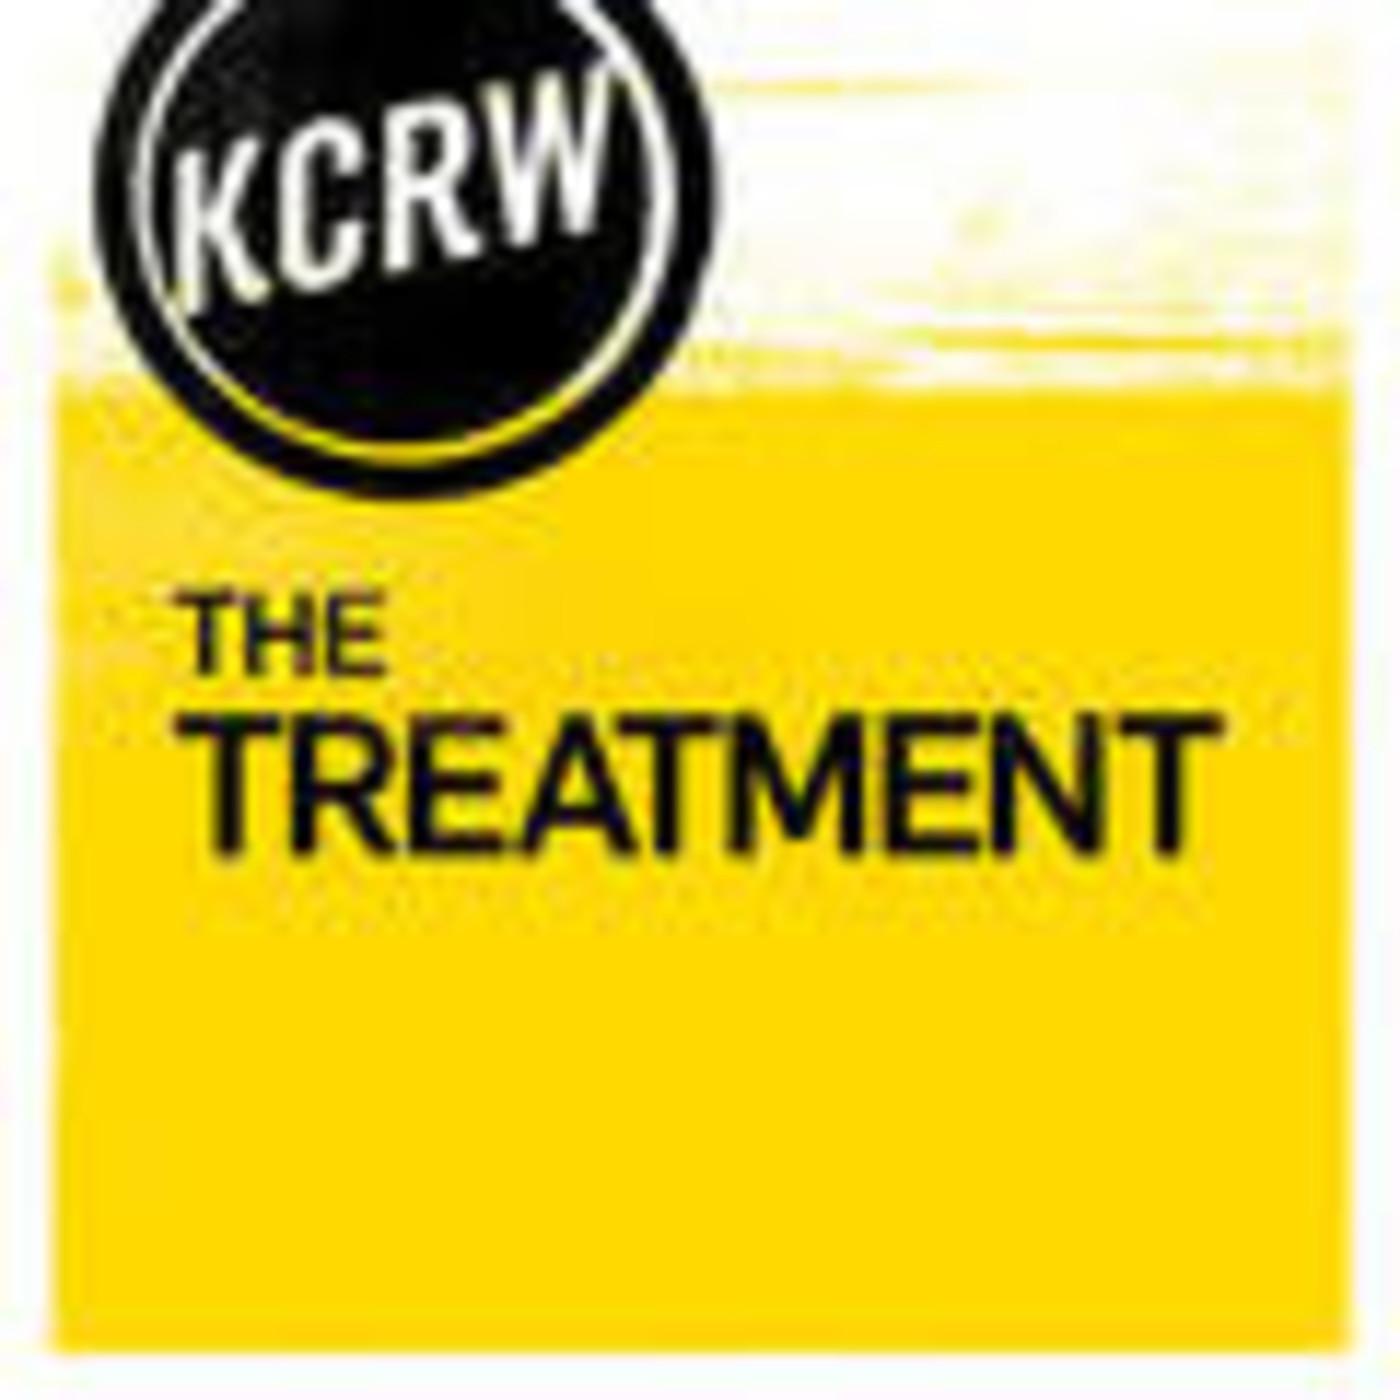 Elvis Mitchell, KCRW.com